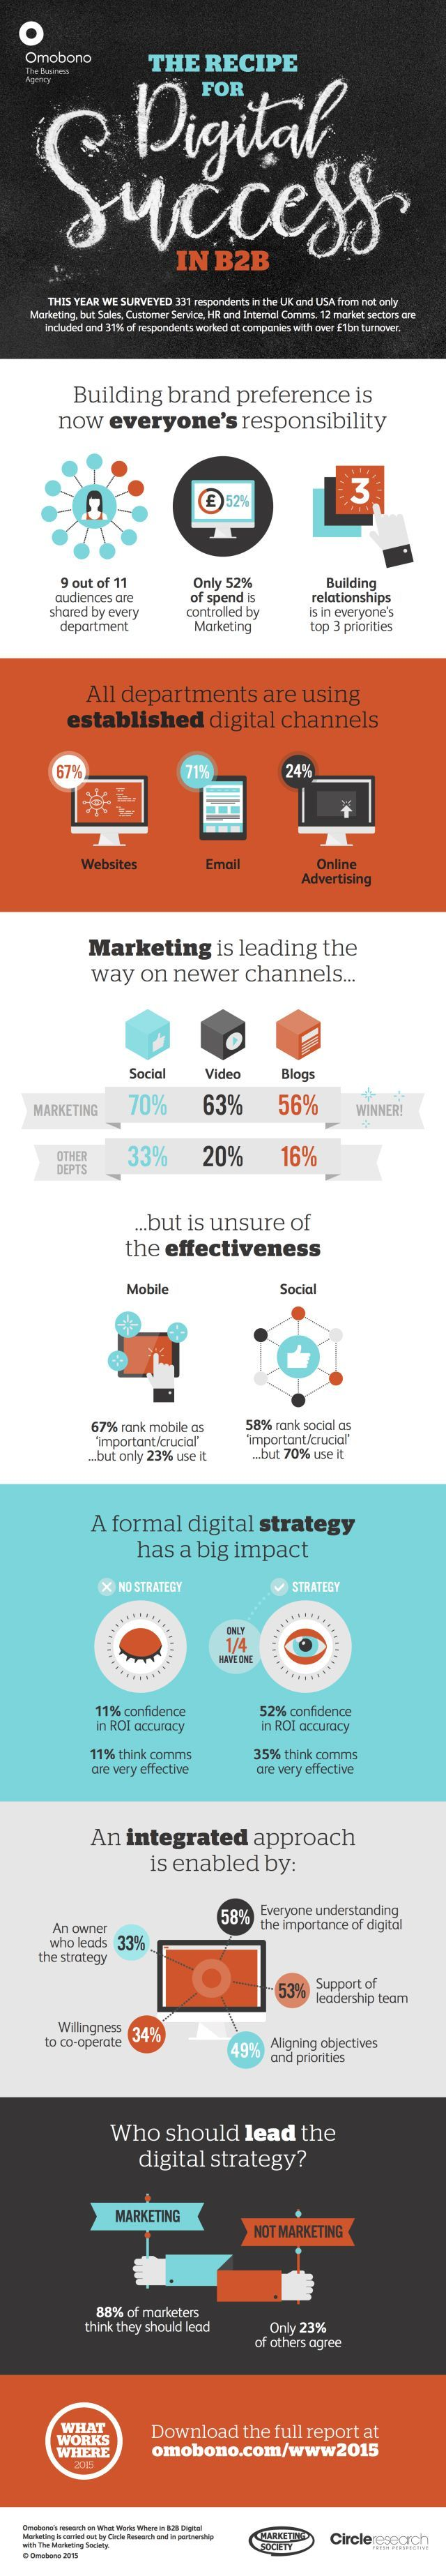 Erfolg im Digital Marketing für B2B-Unternehmen via Social Media [Infografik]